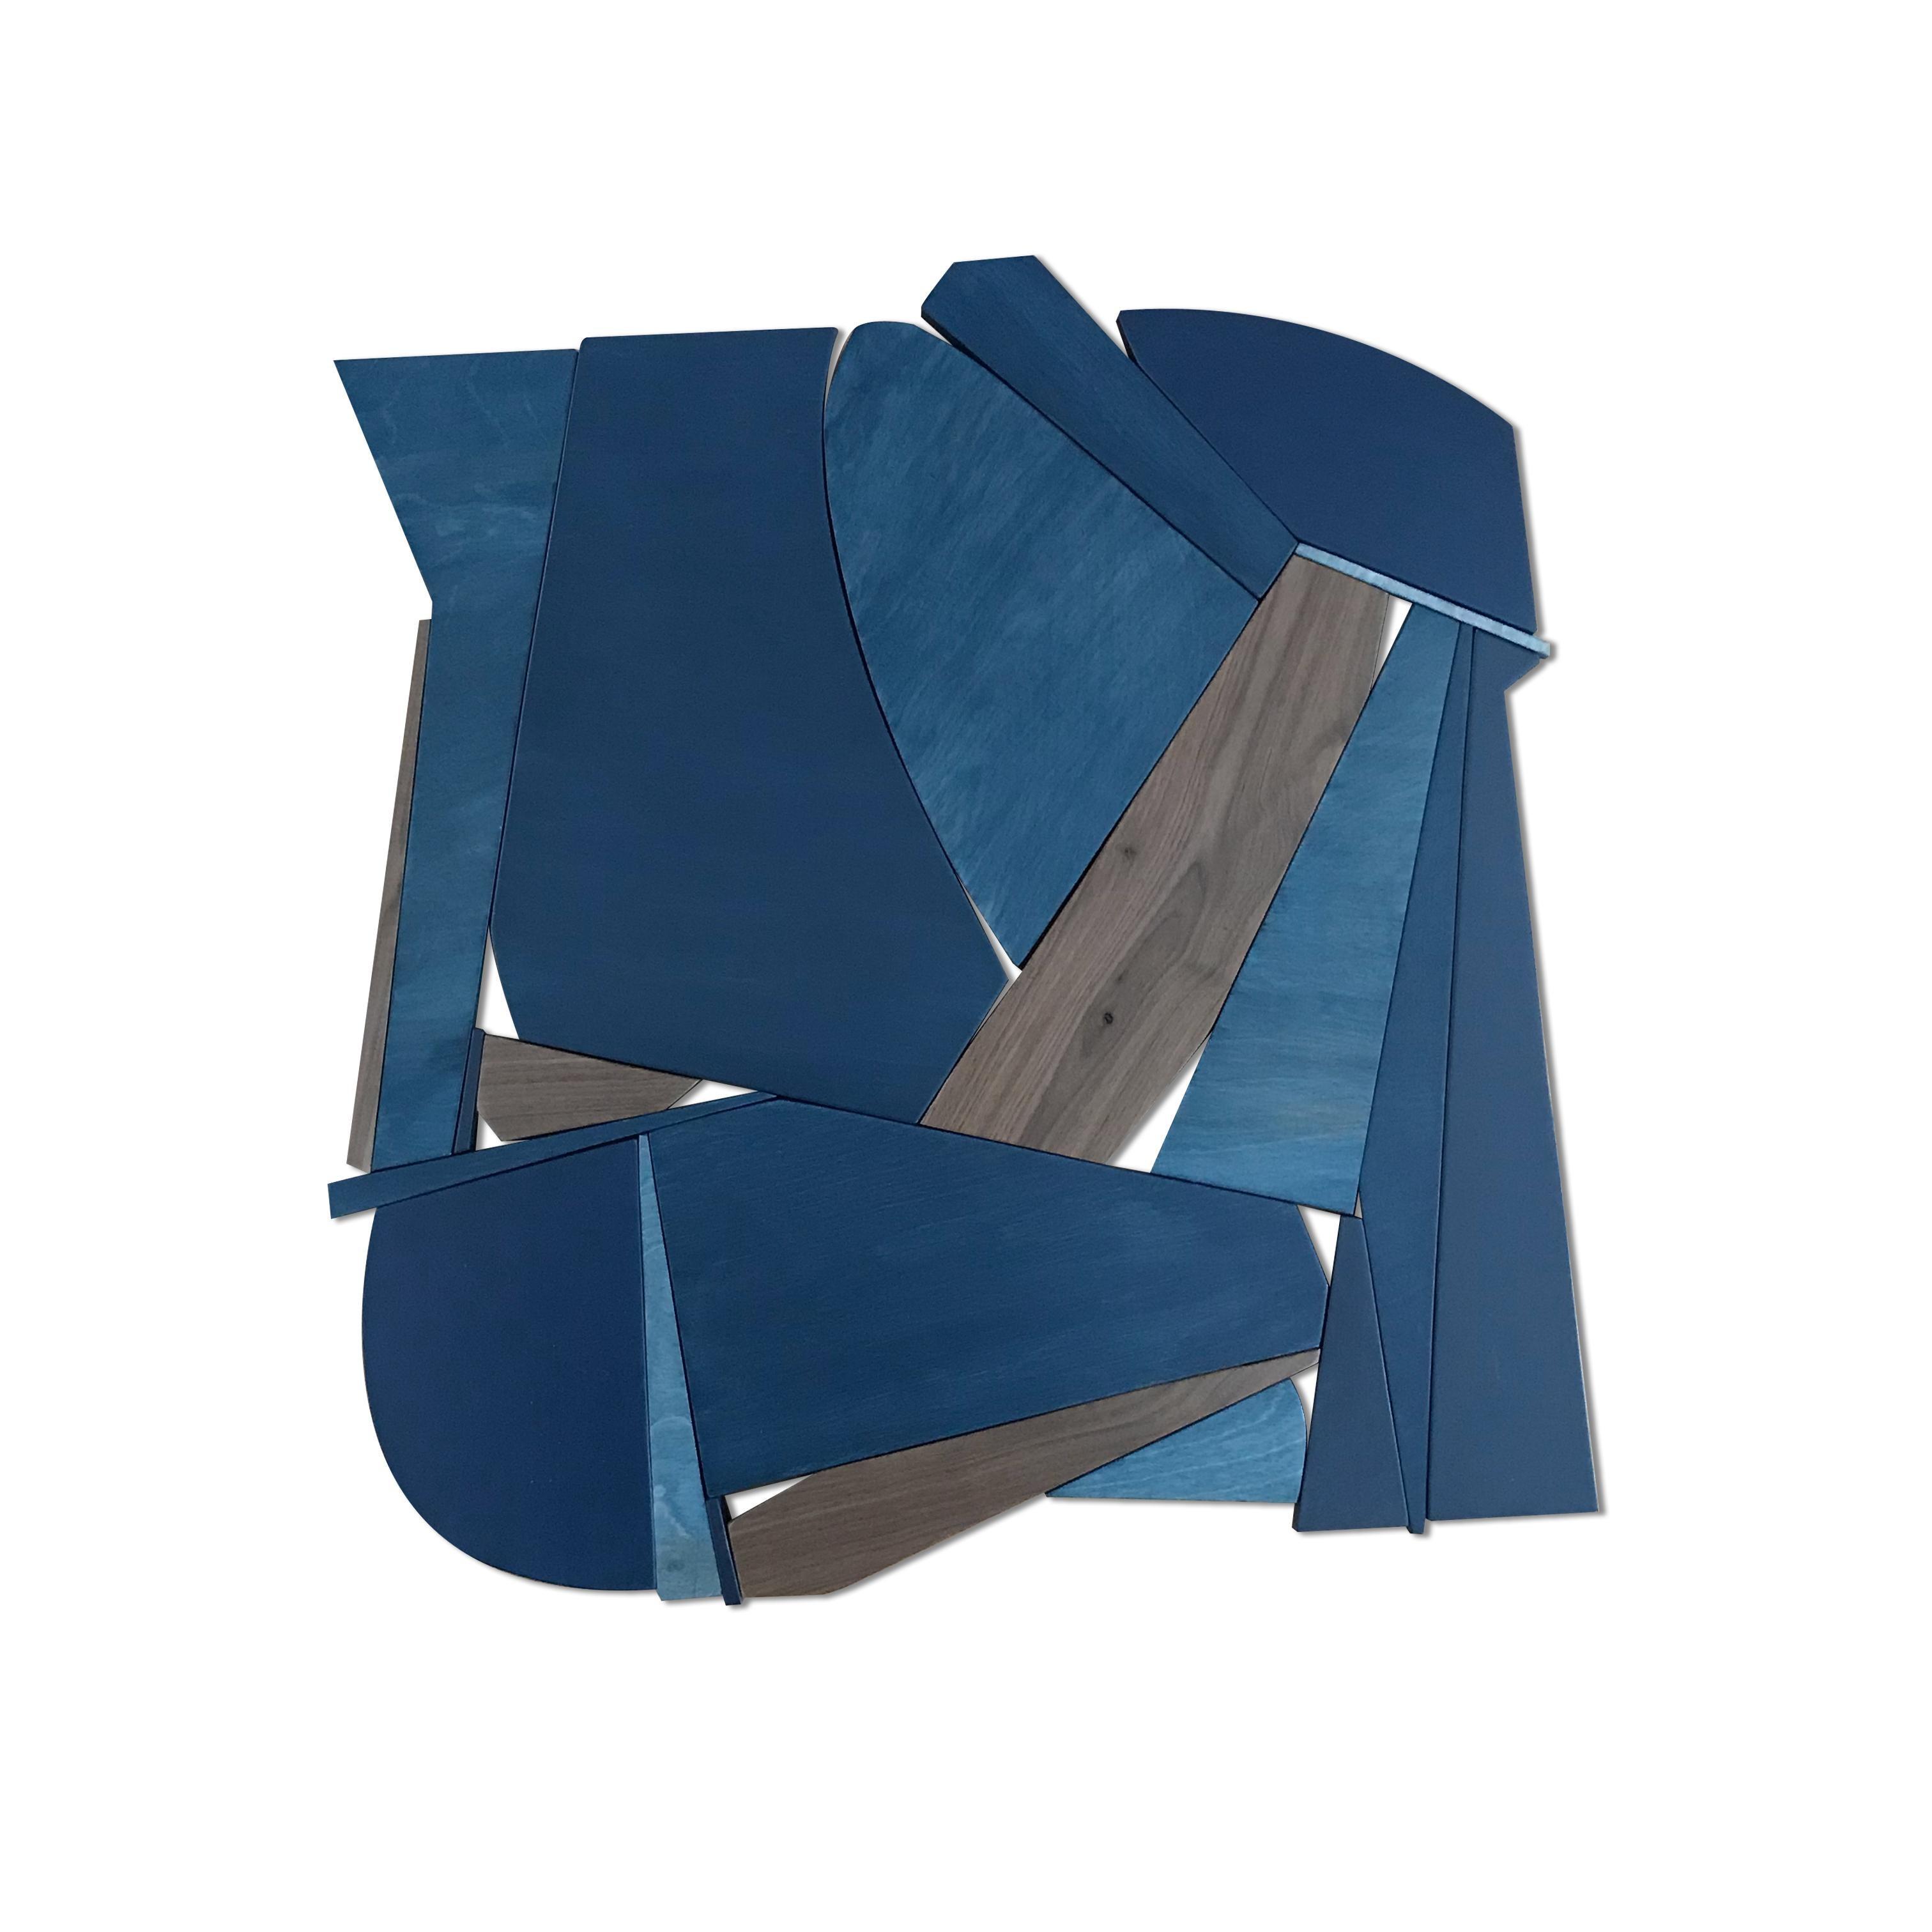 Denim Blue I (modern abstract wall sculpture minimal monochrome art deco wood)